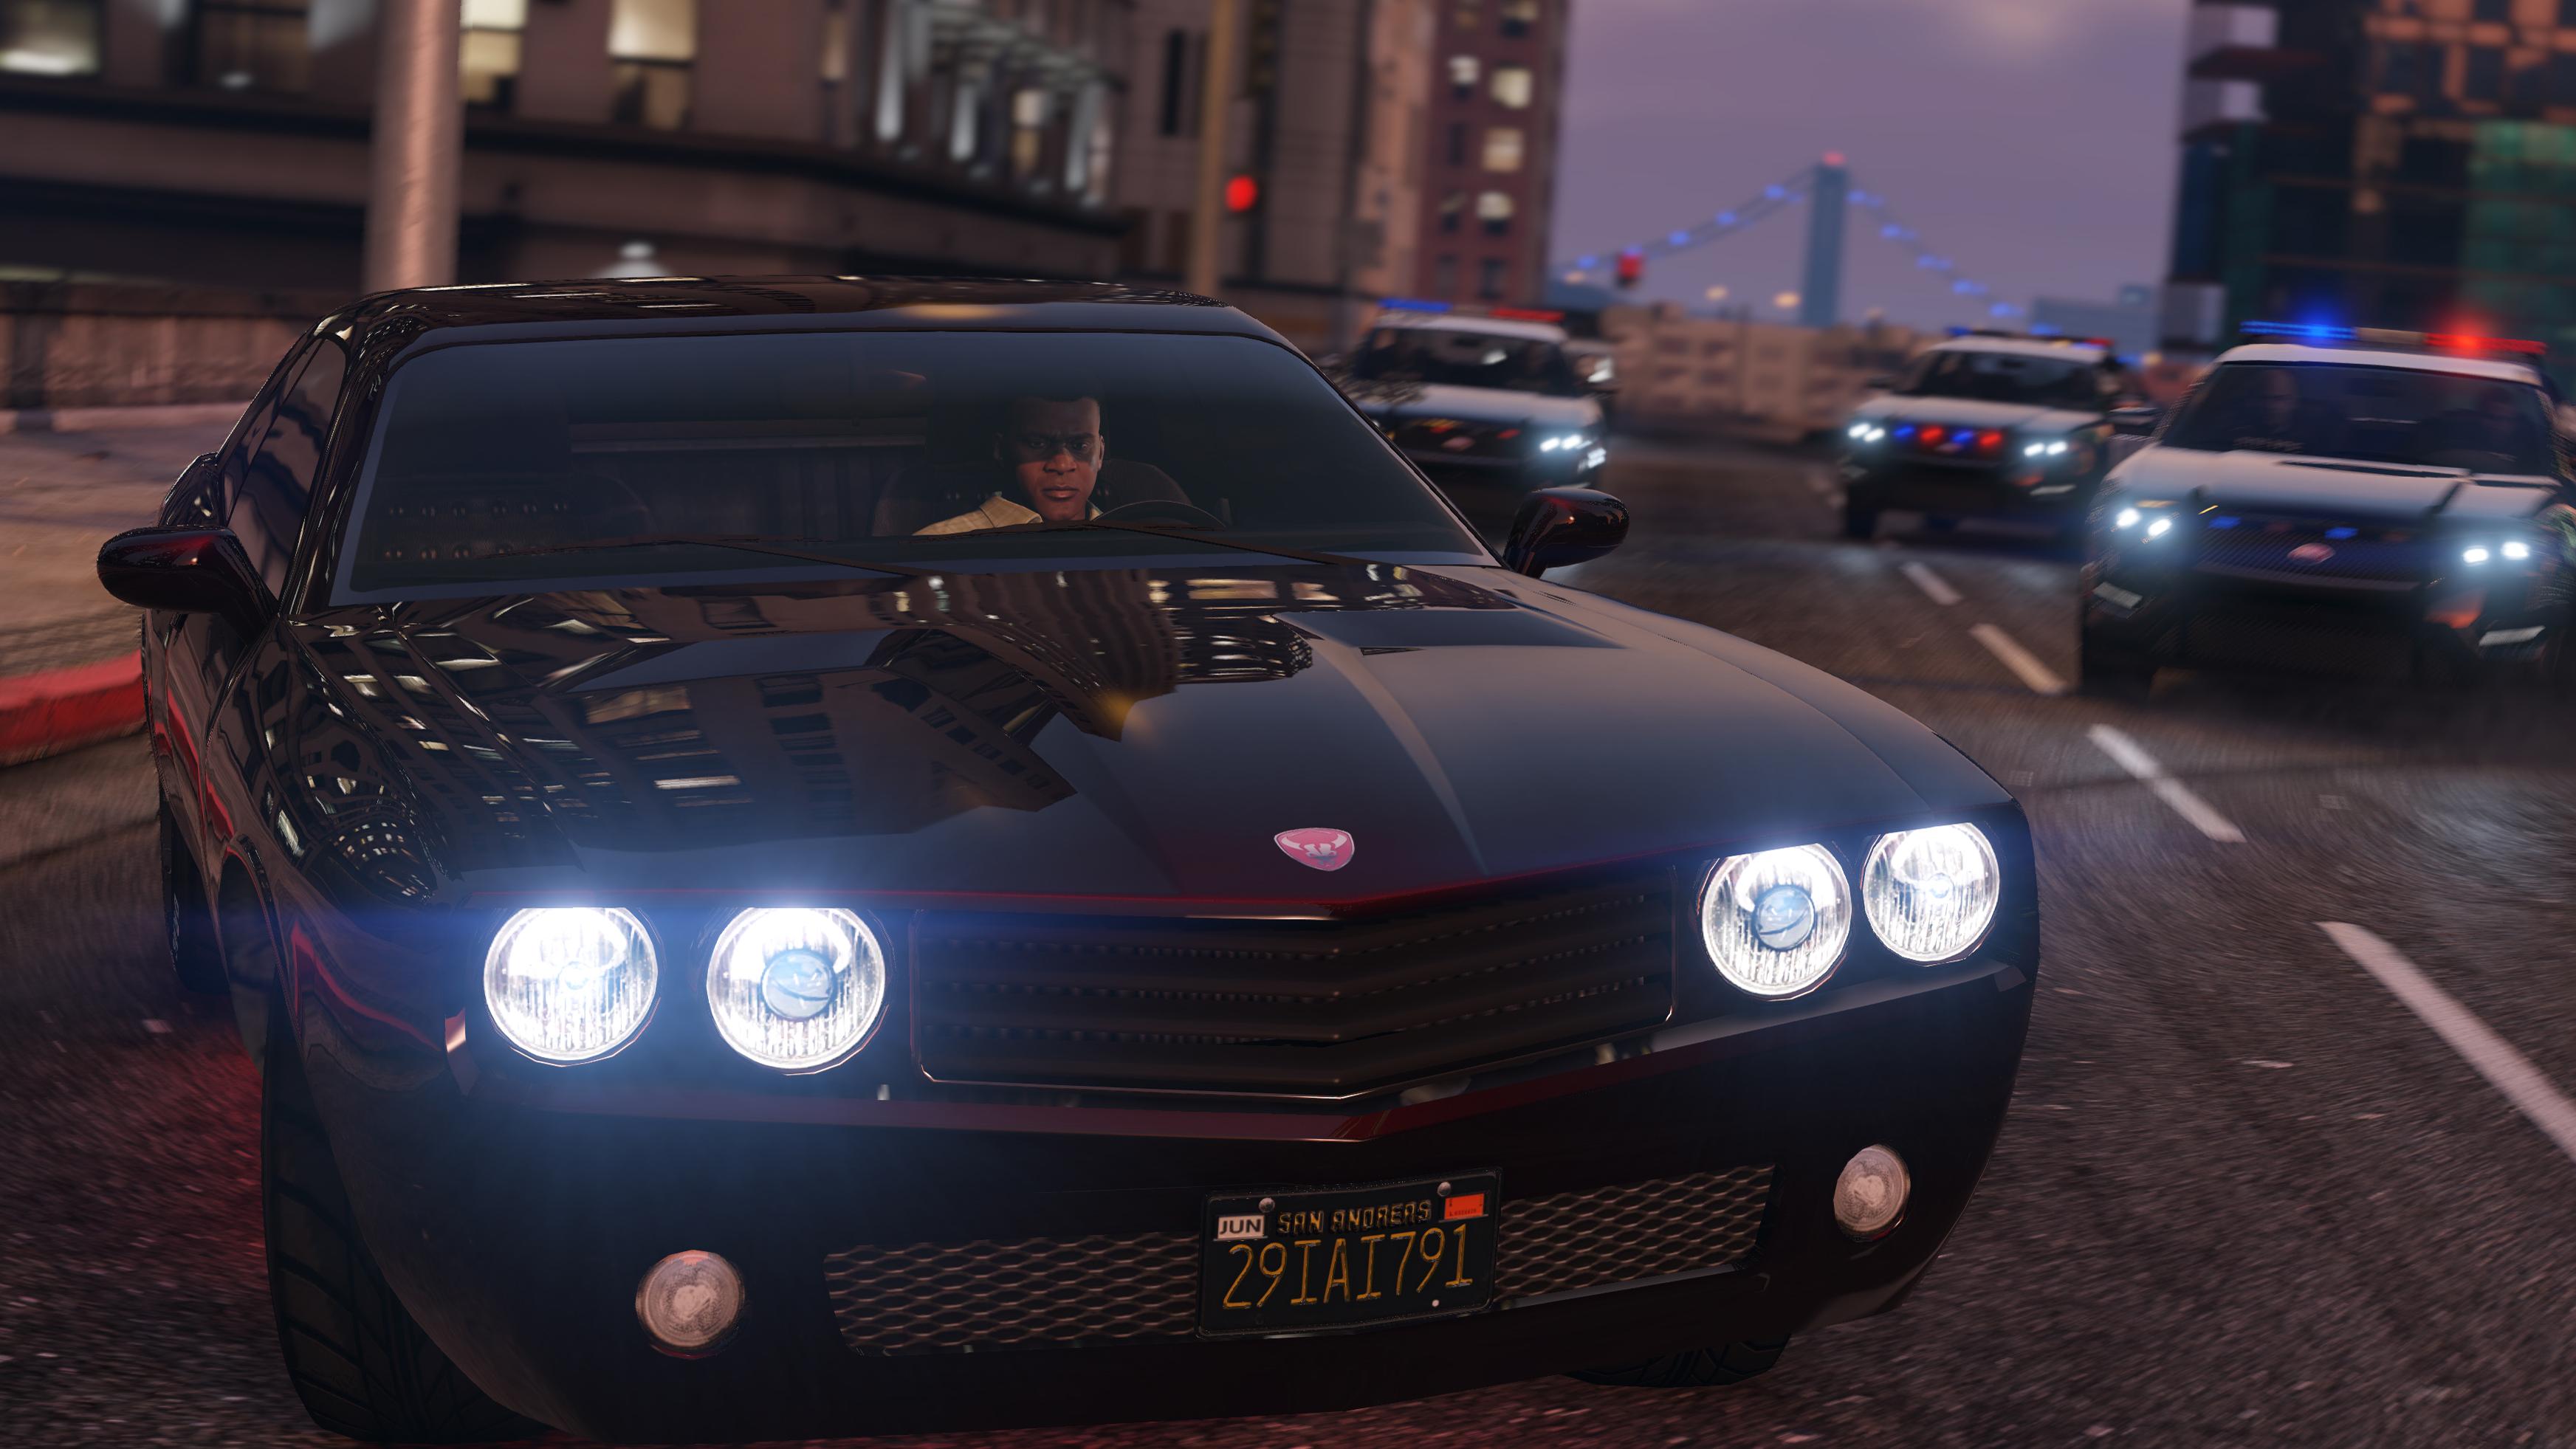 Gta 5 ps4 vehicle cheats